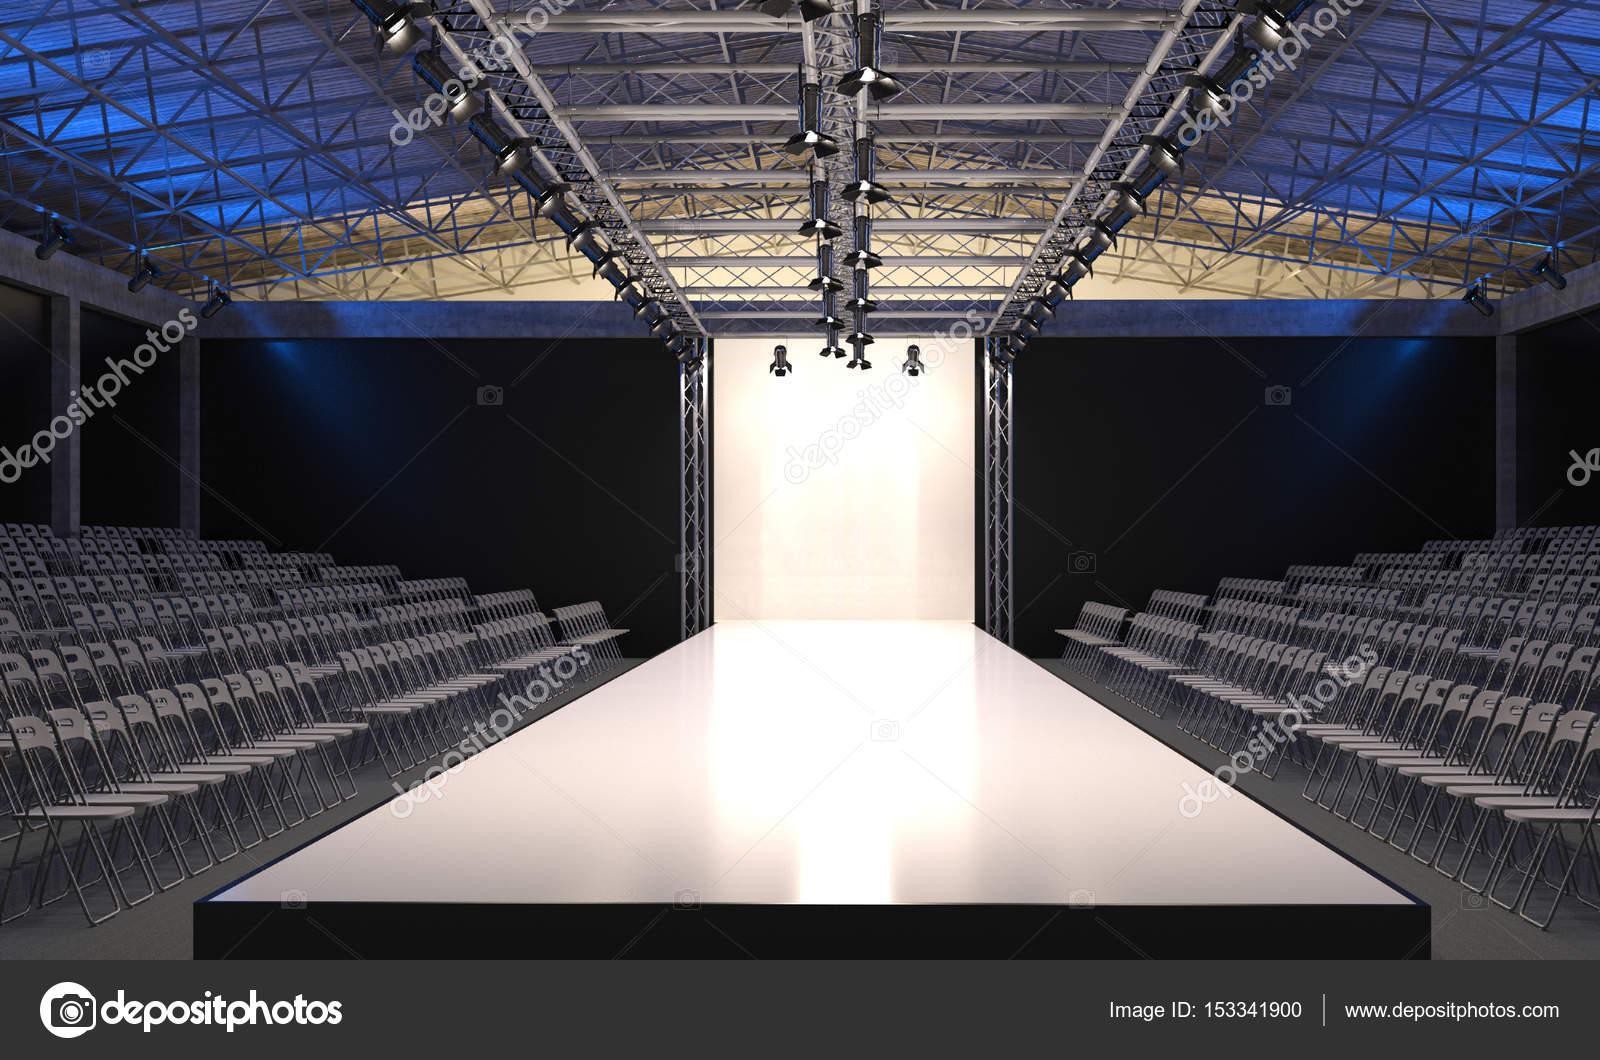 https://st3.depositphotos.com/9600988/15334/i/1600/depositphotos_153341900-stock-photo-interior-of-the-auditorium-with.jpg